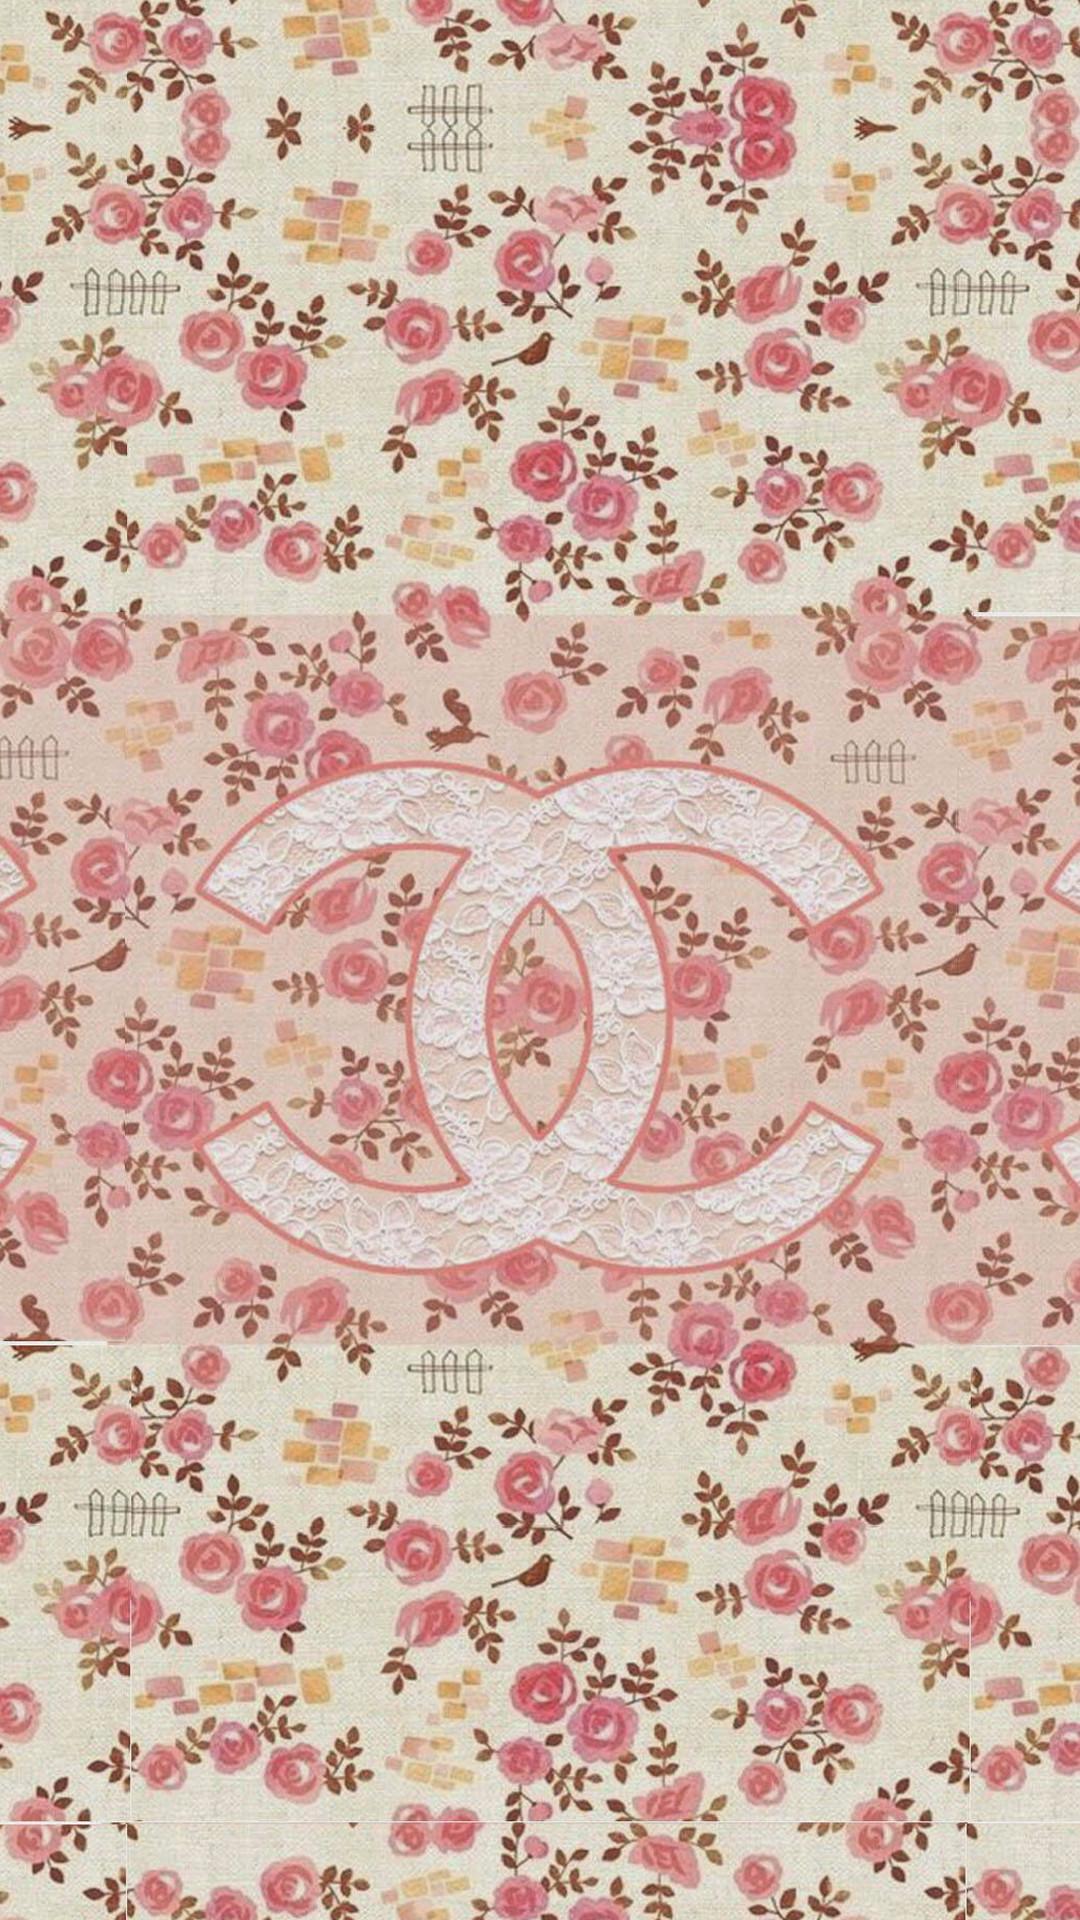 Coco Chanel Flowers Pattern Logo iPhone 6 Plus HD Wallpaper